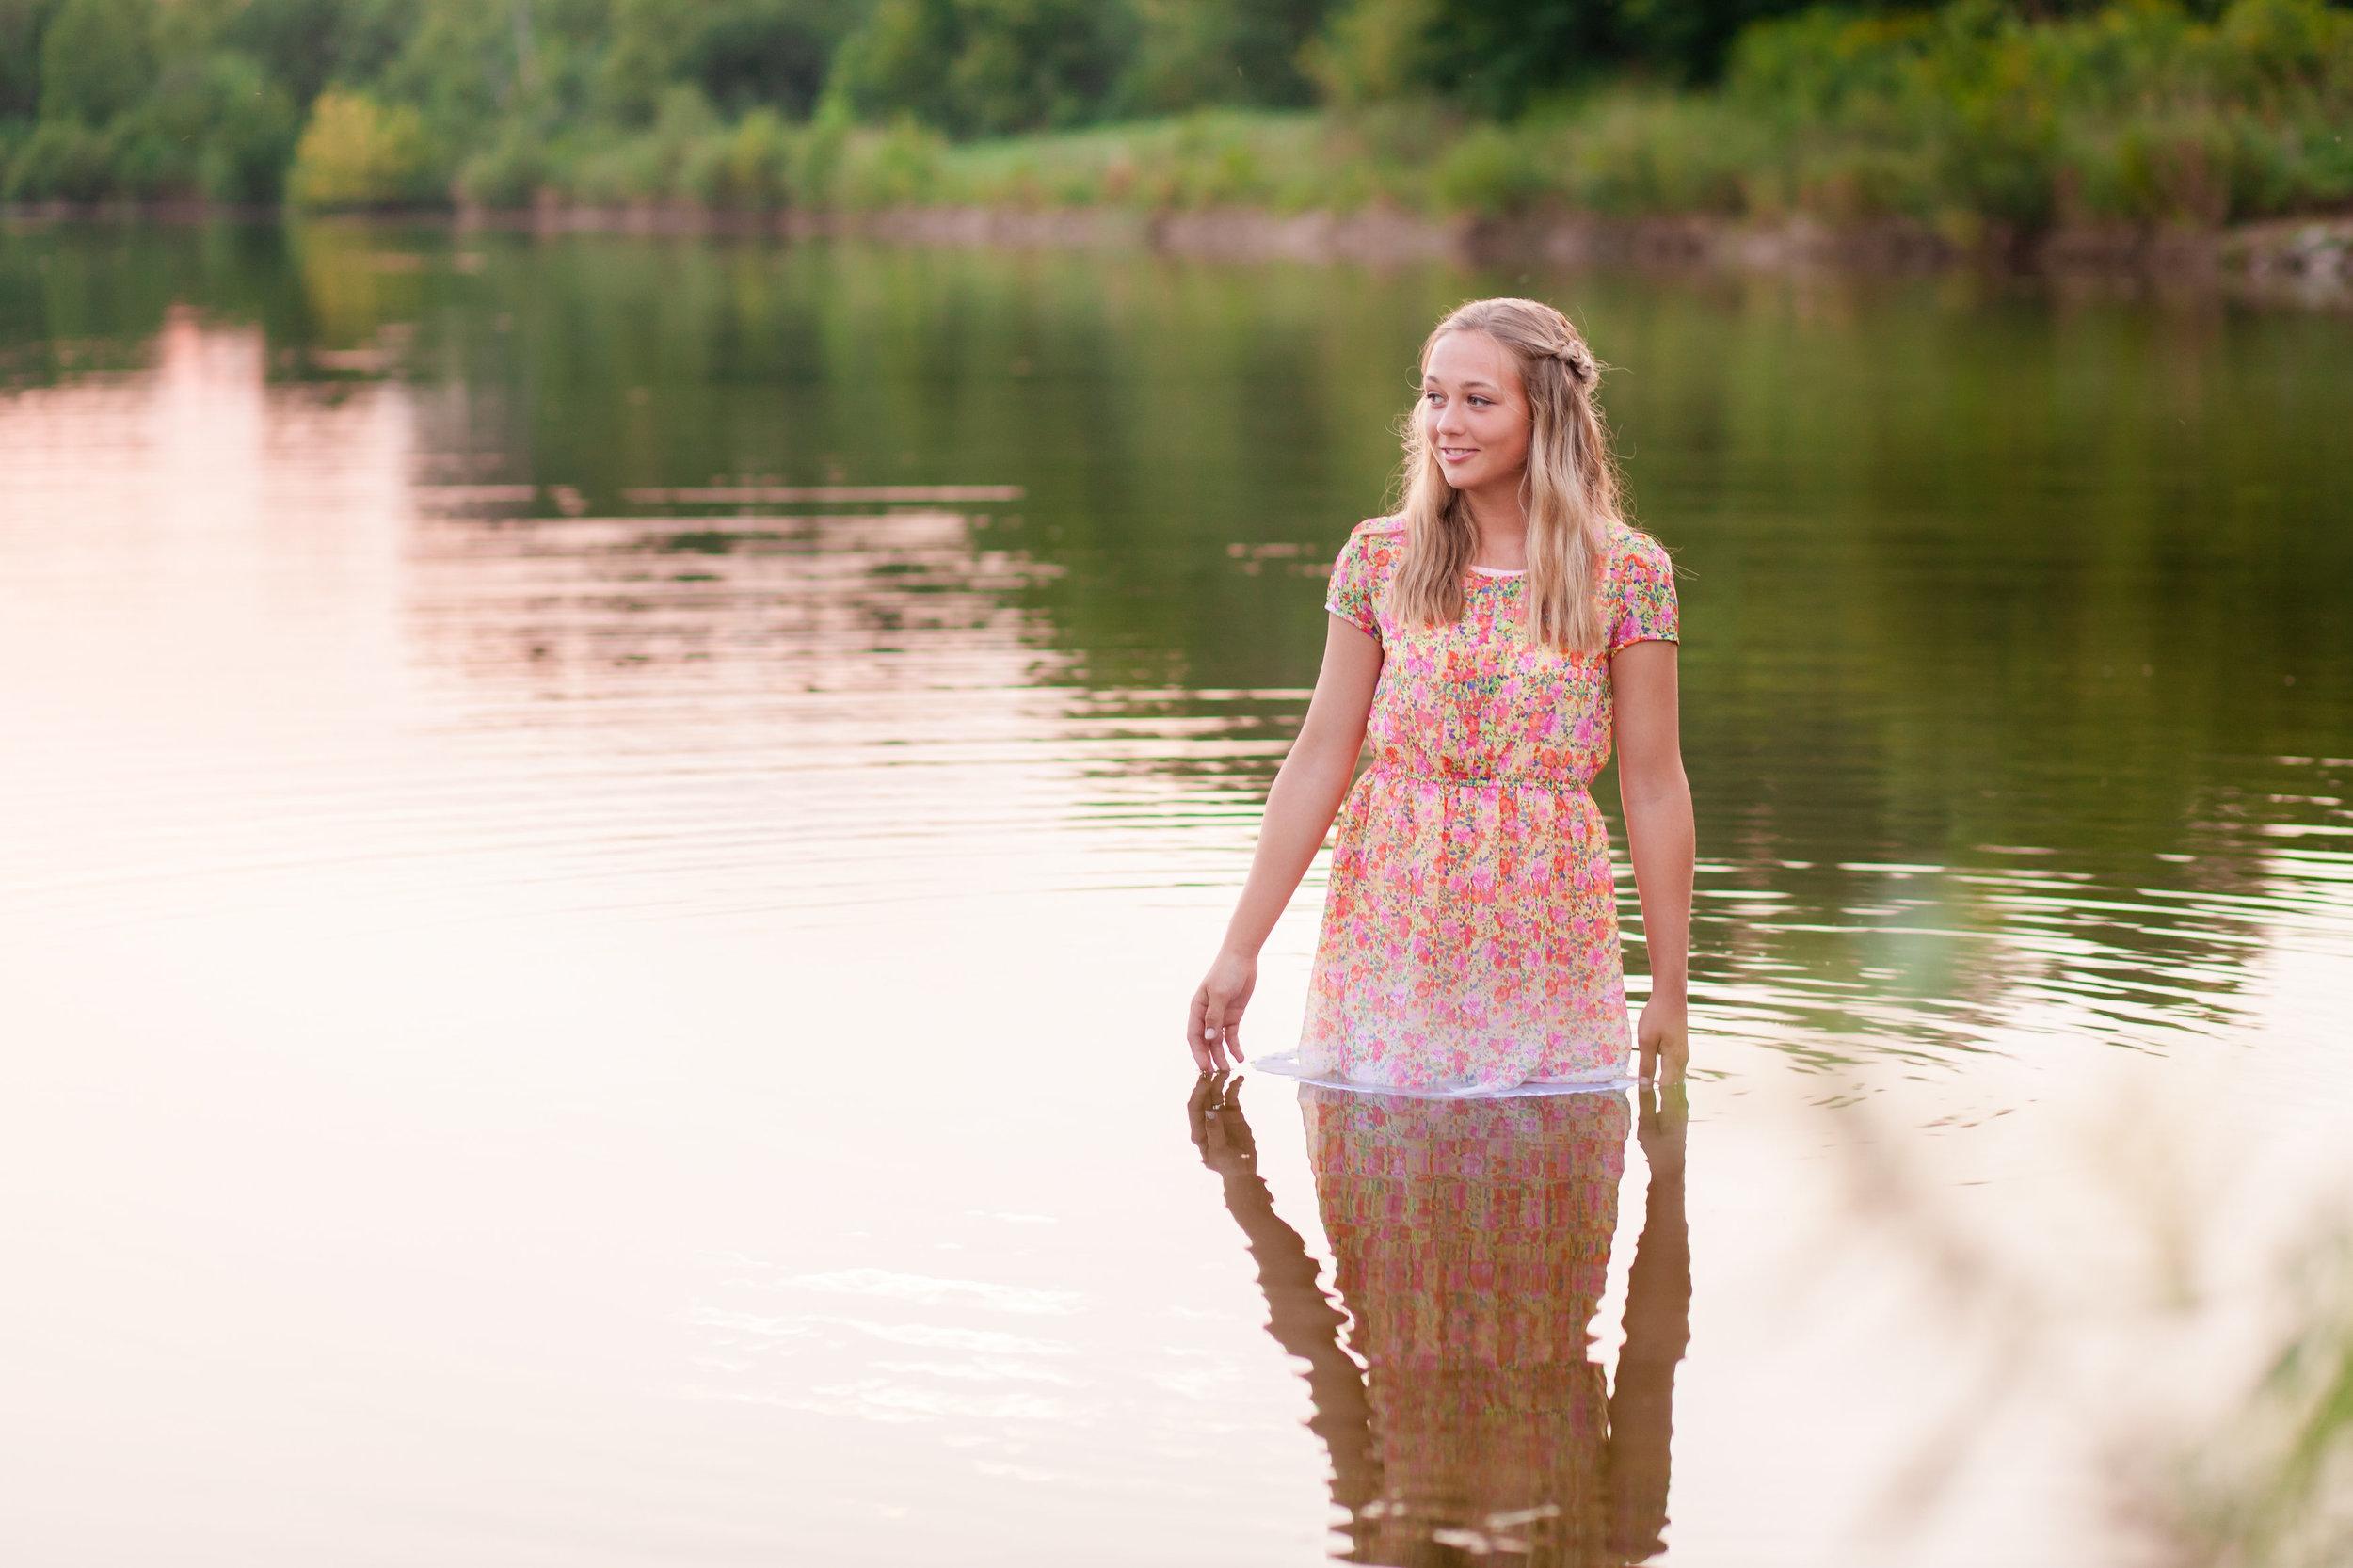 Elise Seeley 2014-Elise Seeley 2014-0038.jpg